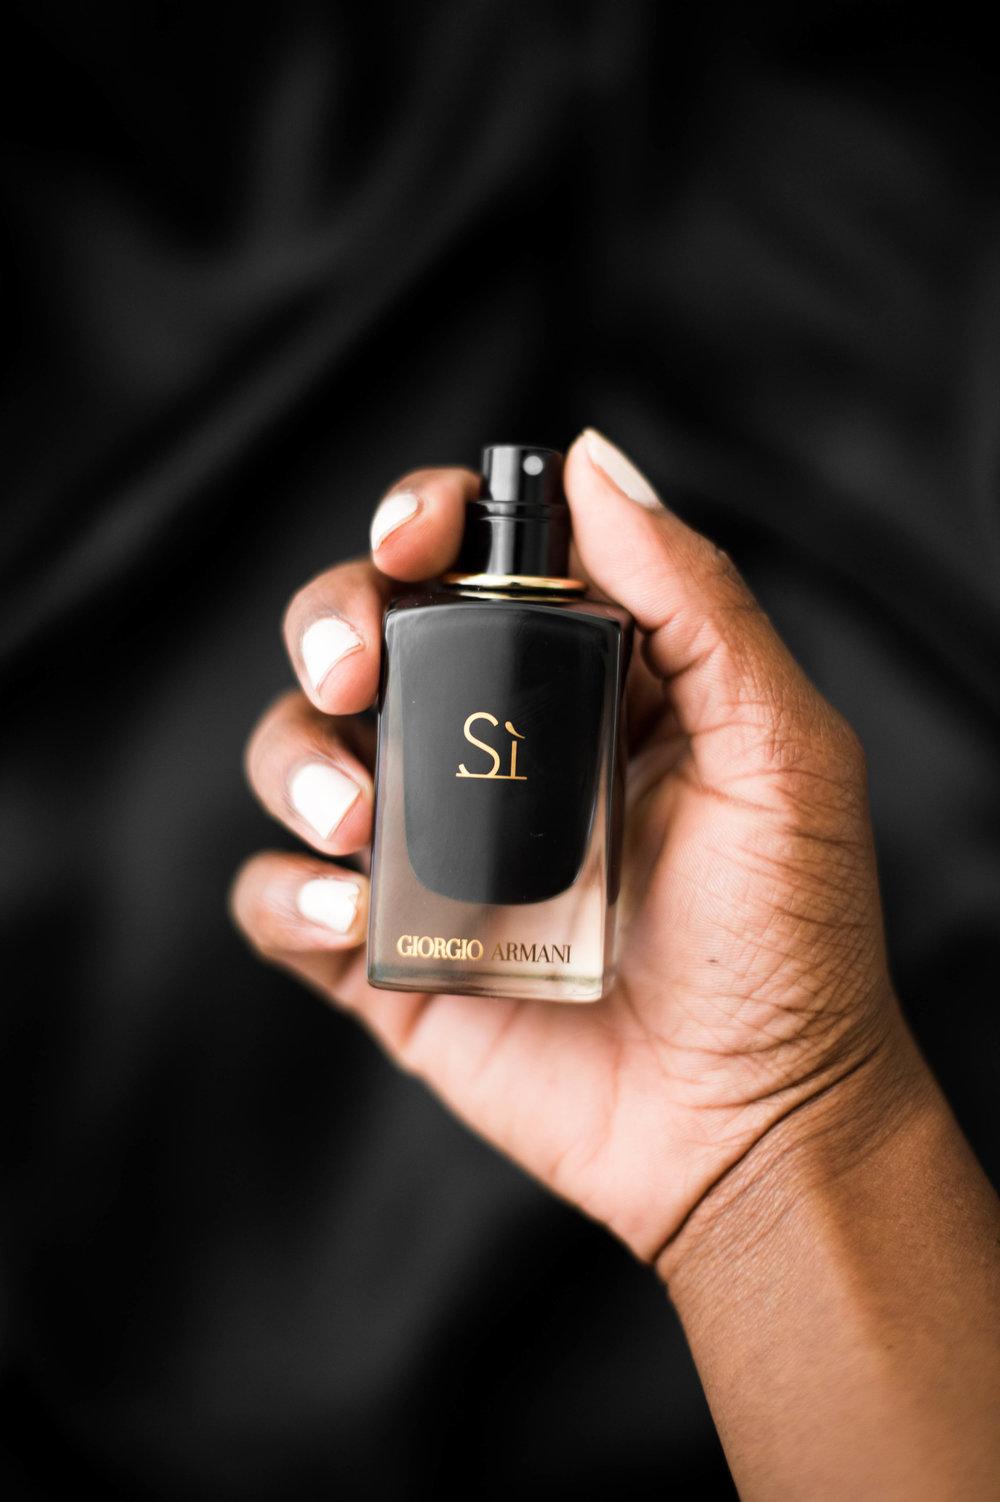 Saysi Giorgio Armani Sì Intense Perfume Review The Glossier